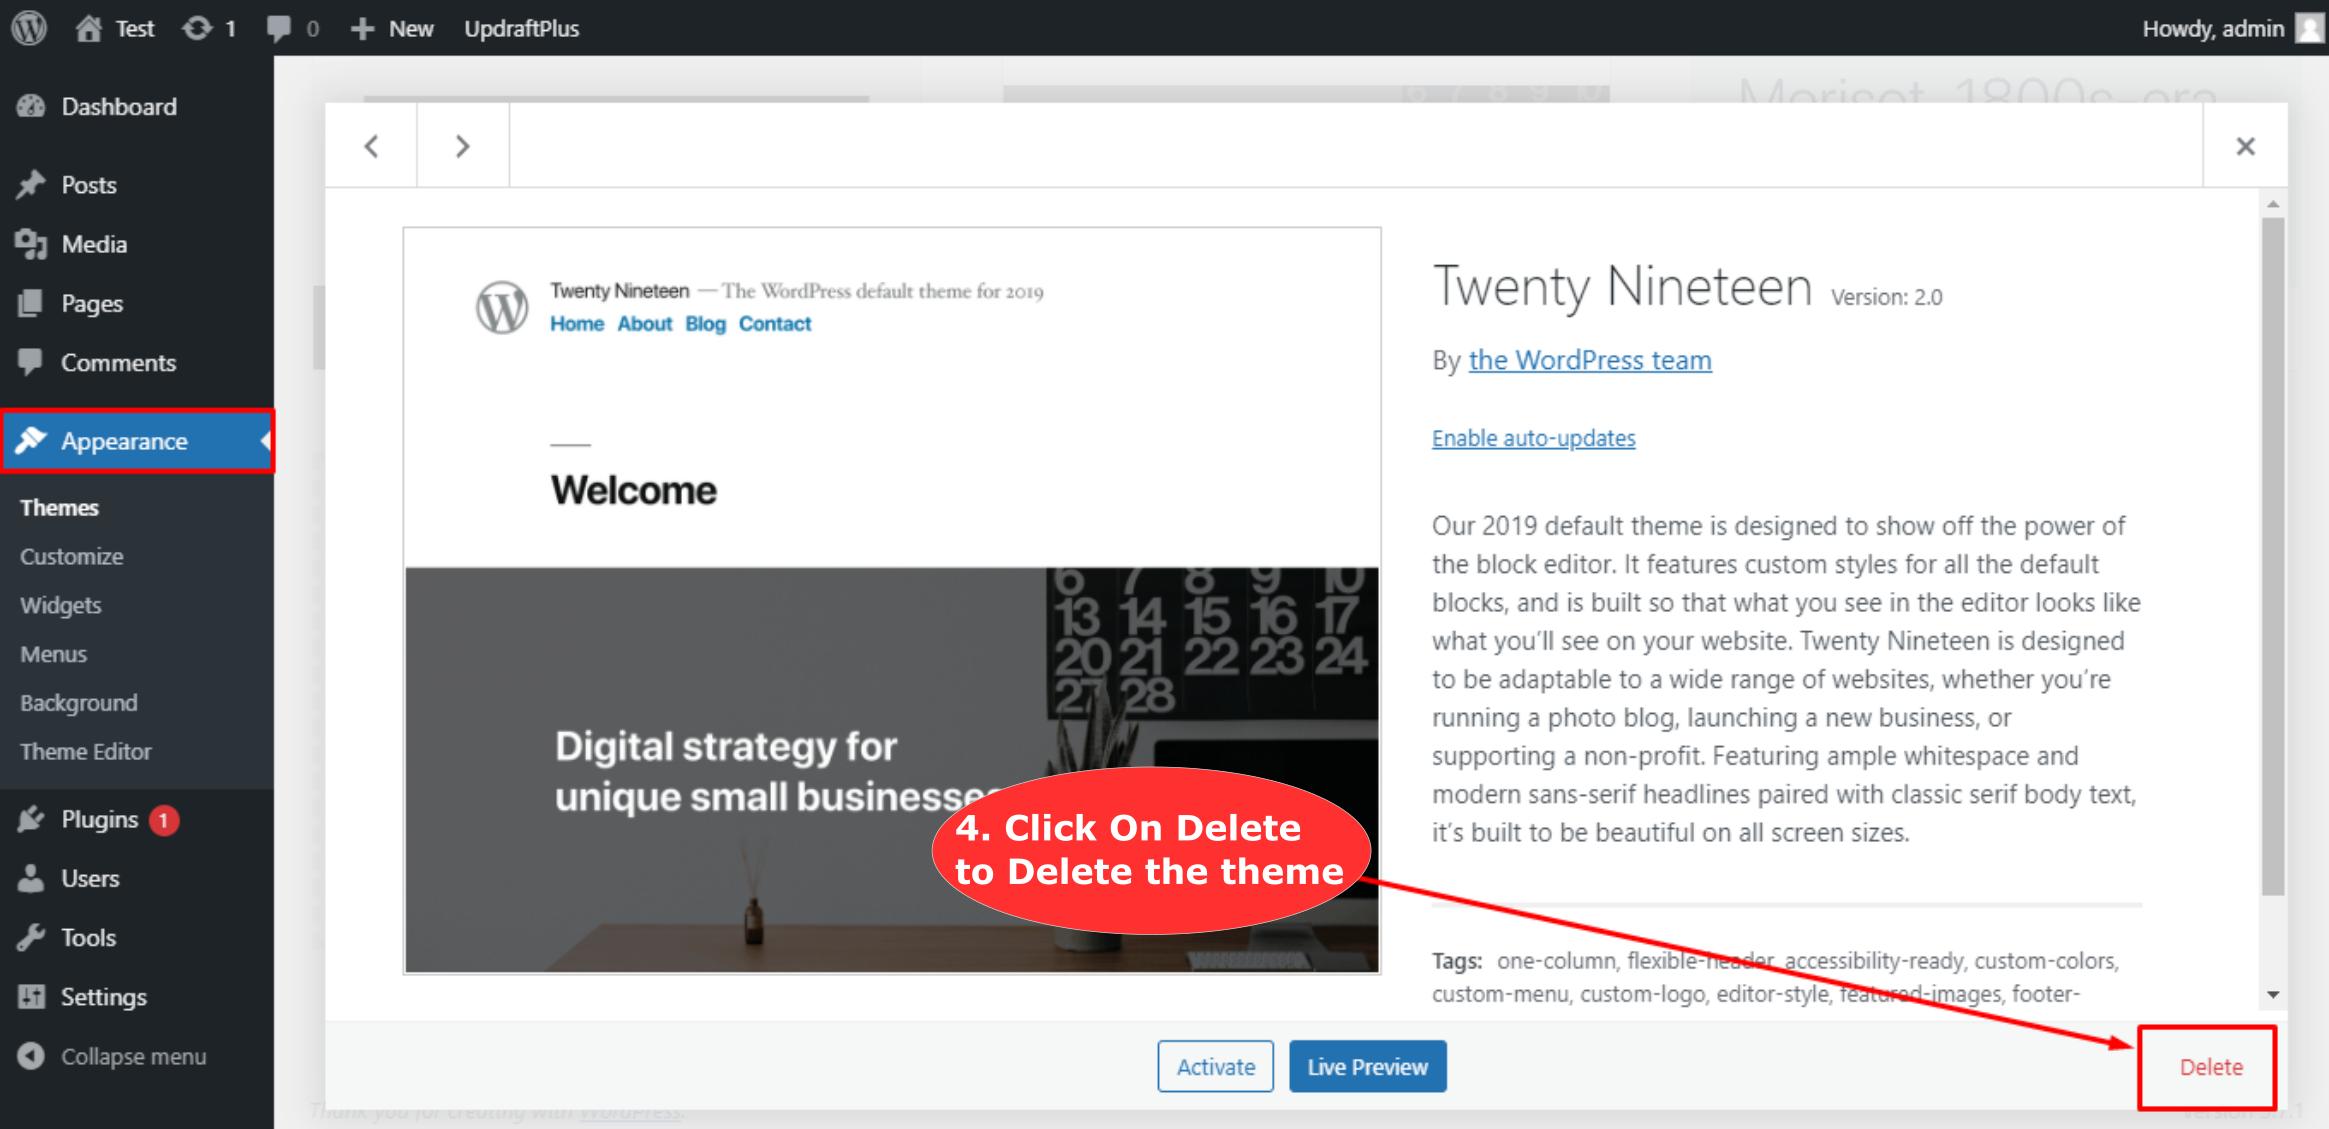 Delete Theme in WordPress